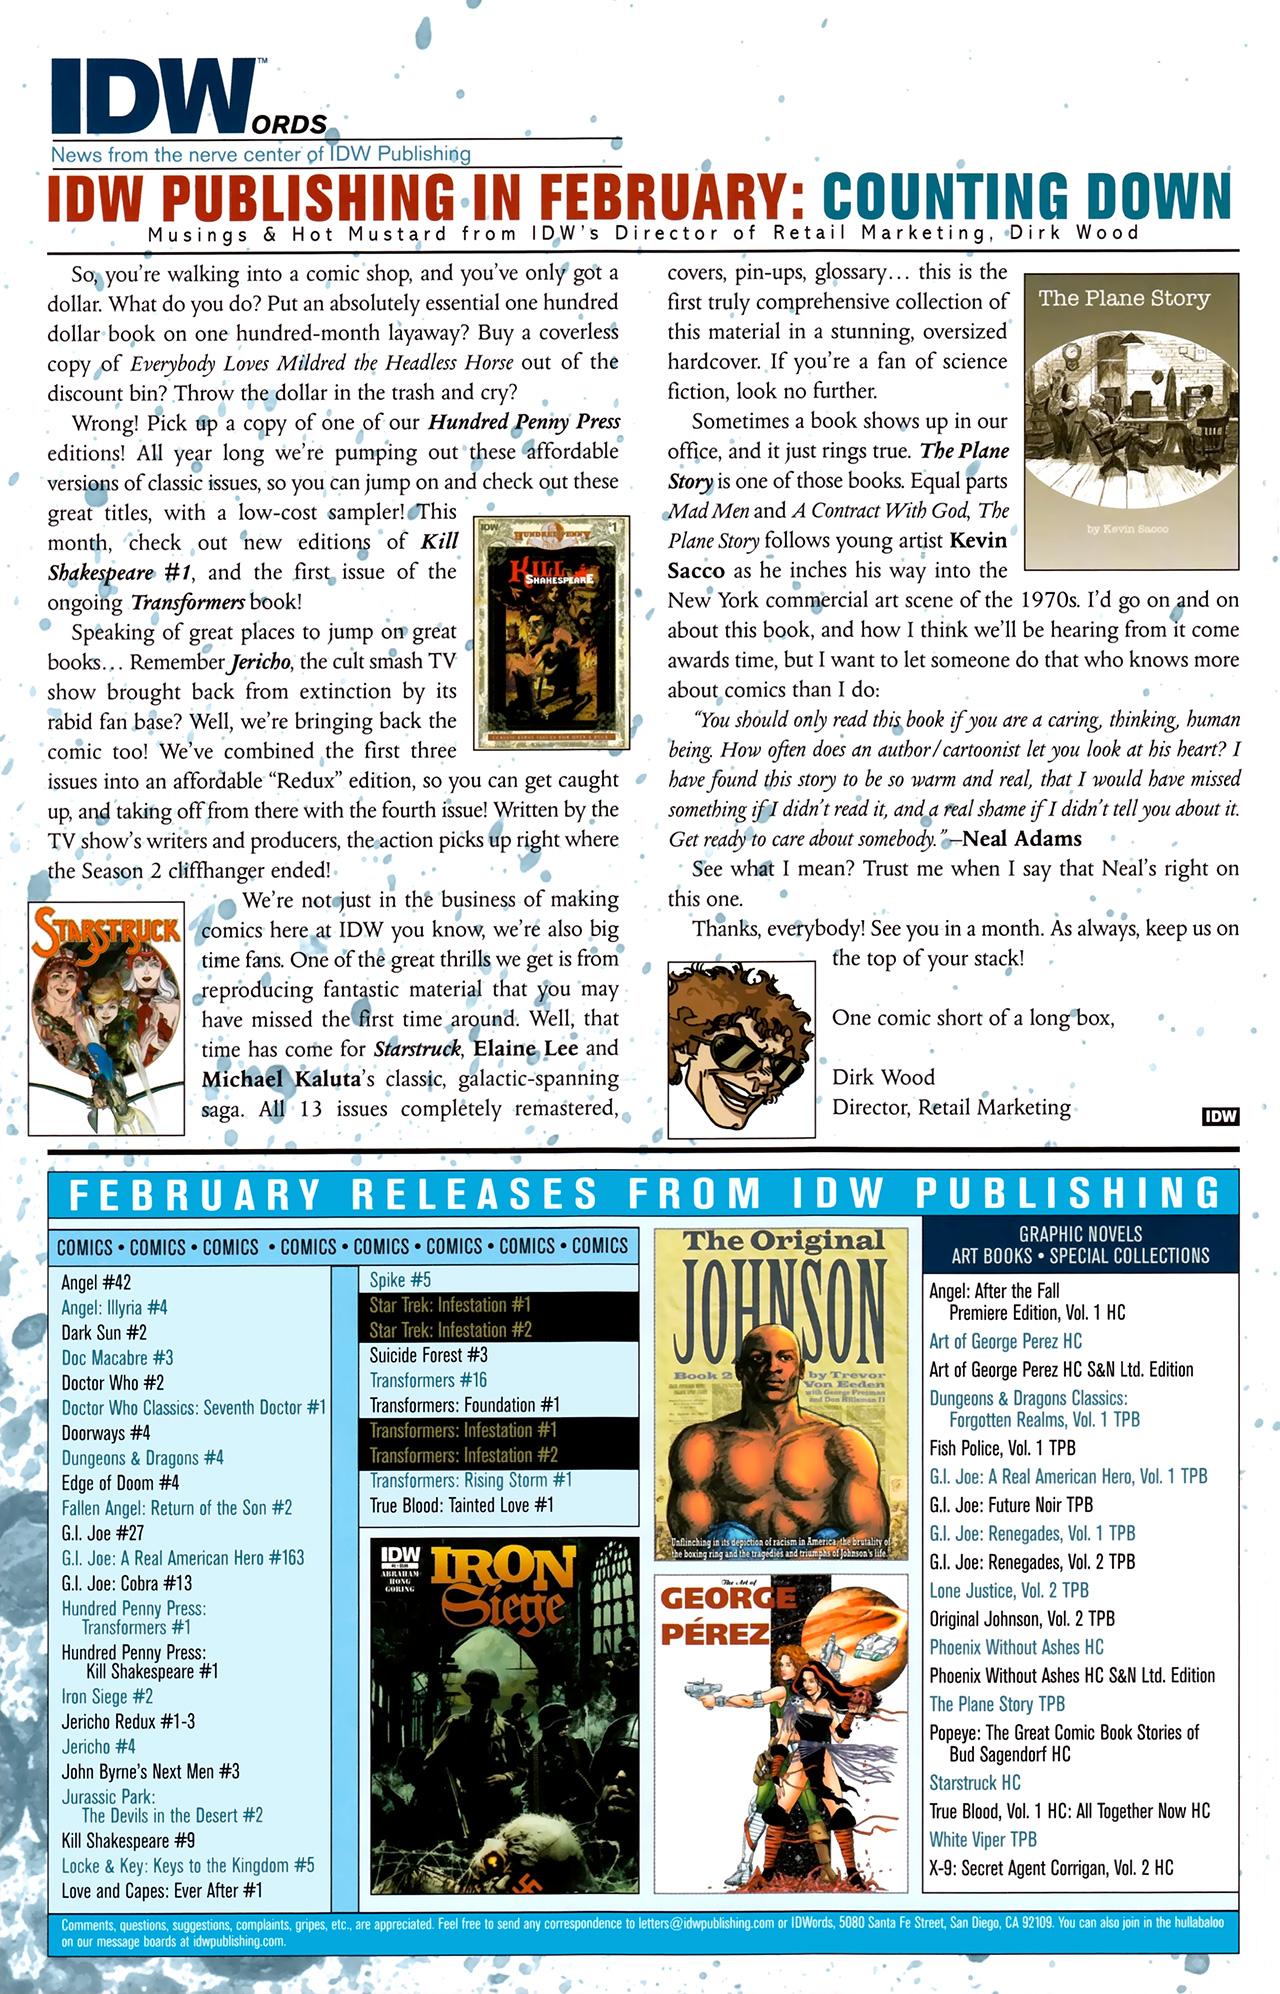 G.I. Joe (2008) Issue # 27 - ReadComic.Org